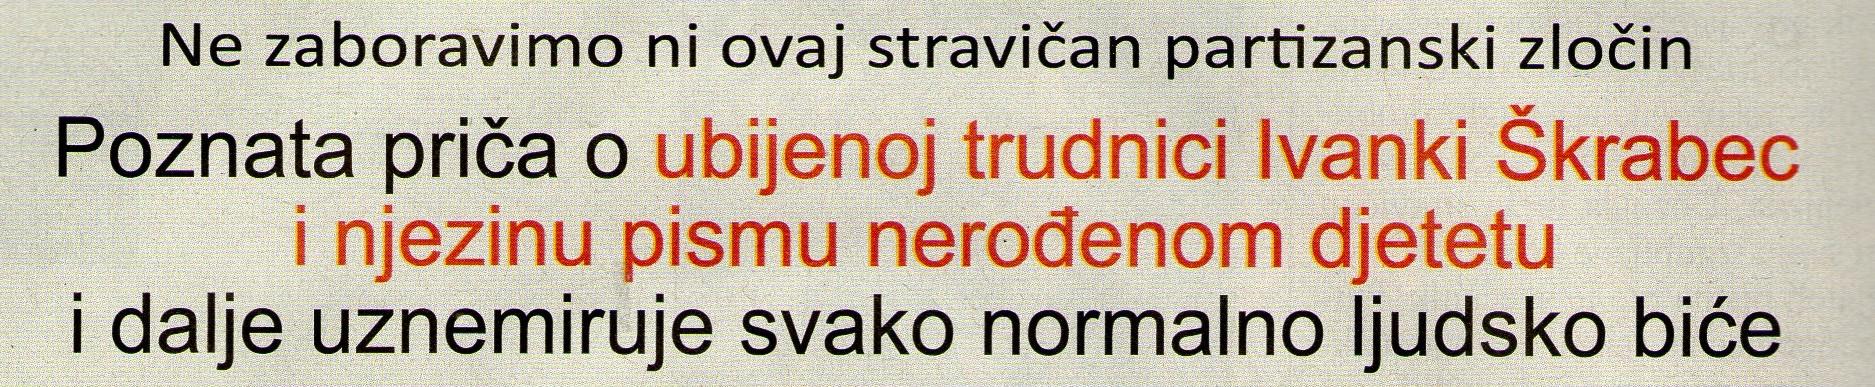 PISMO-NERO-ENOM-DJETEU-1